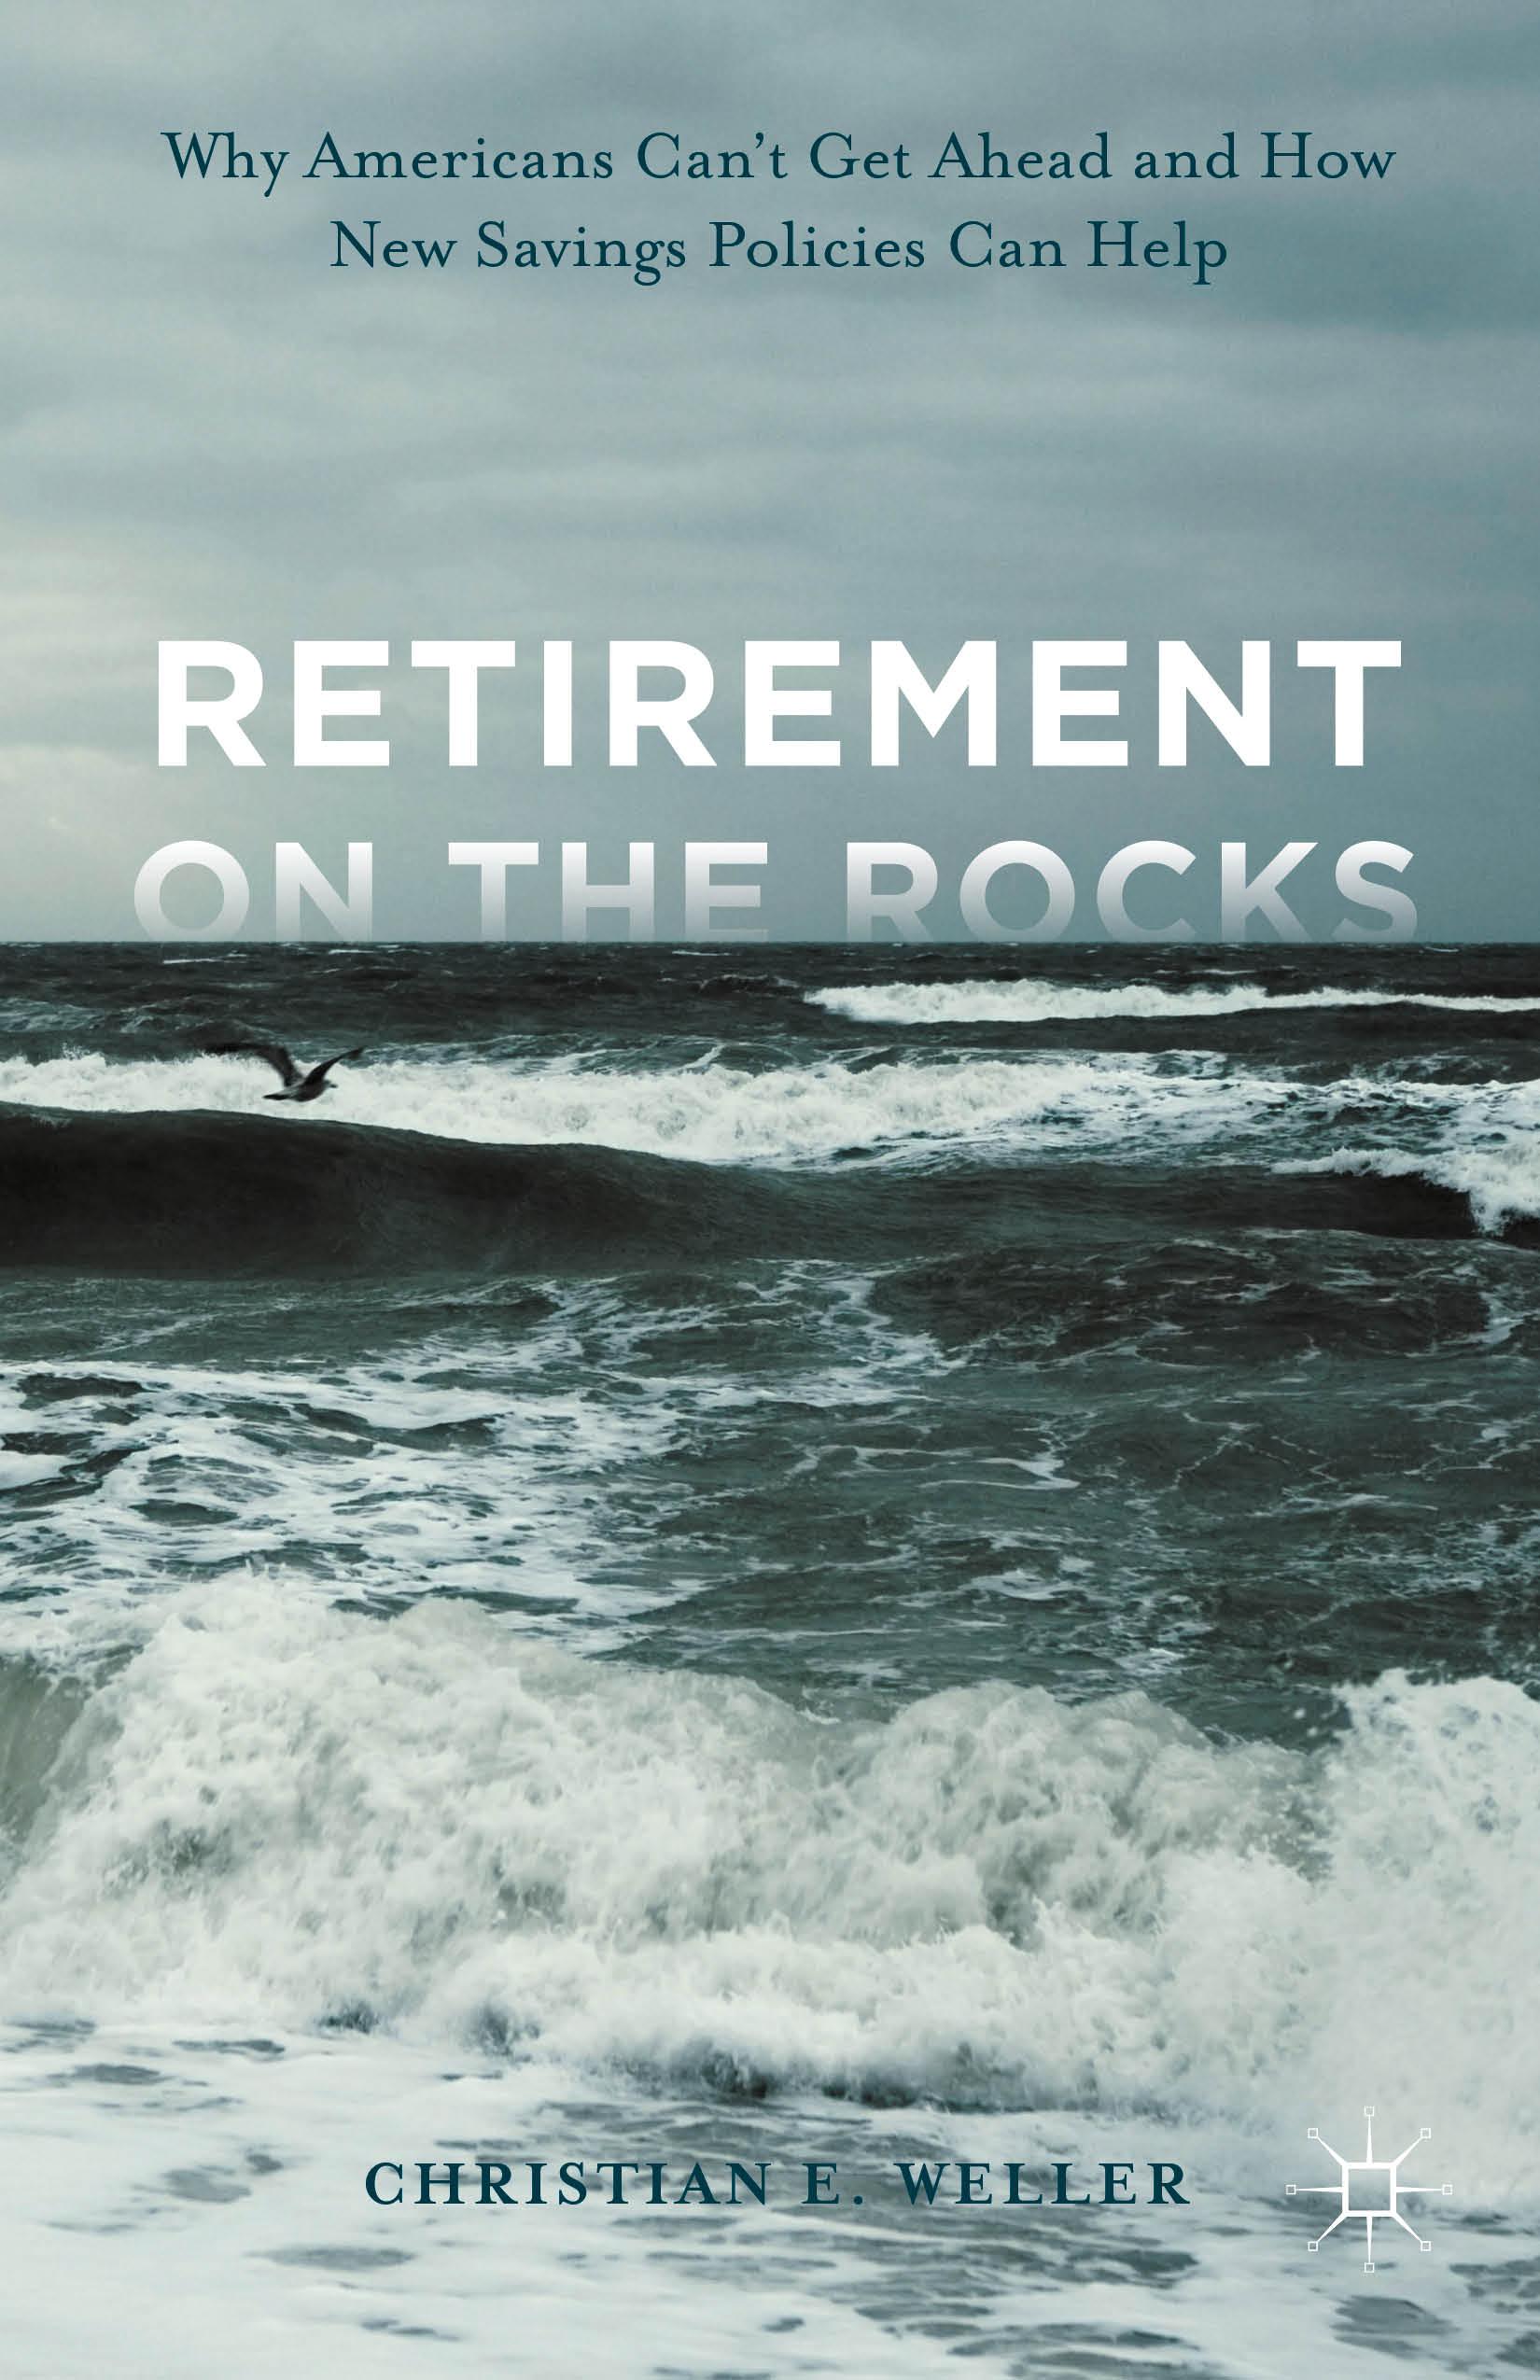 Retirement on the Rocks